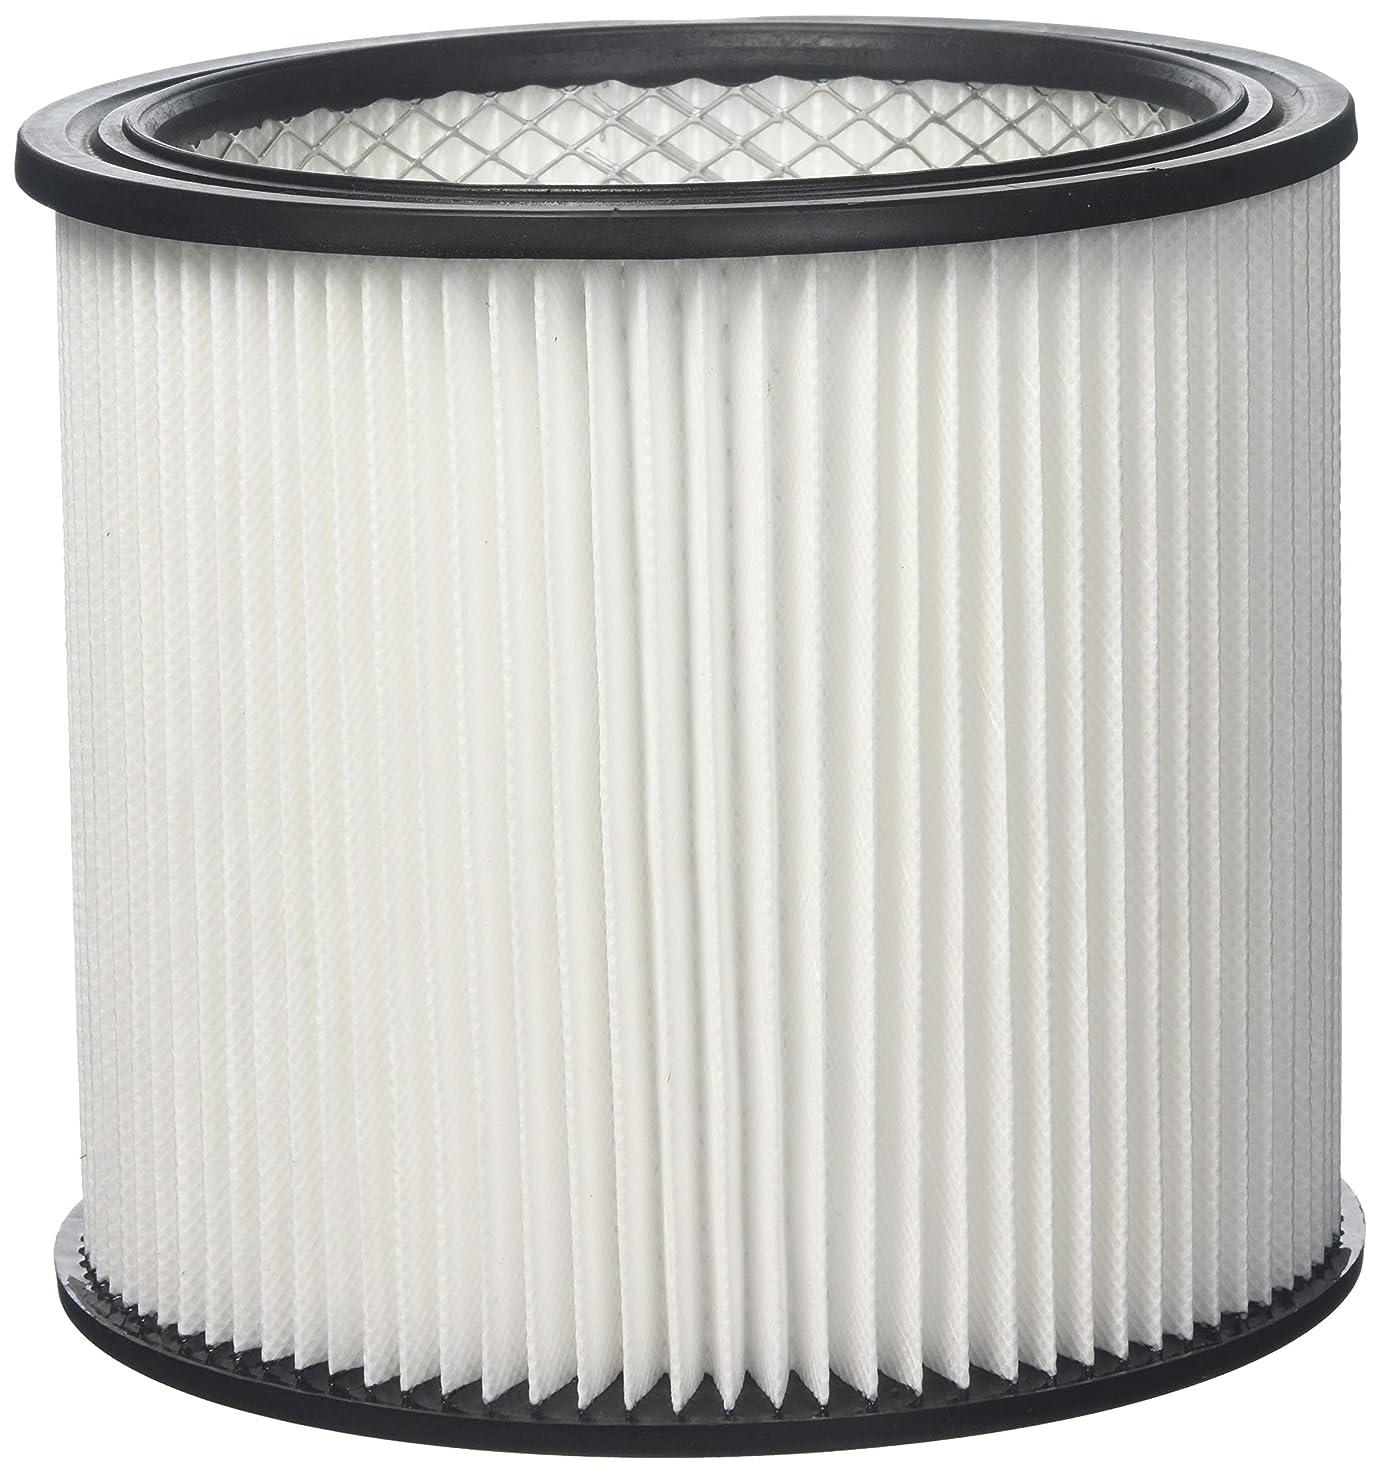 Qualtex Replacement Filter Cartridge for Shop Vac Shop-Vac 9030400, 90304, 903-04-00, 903